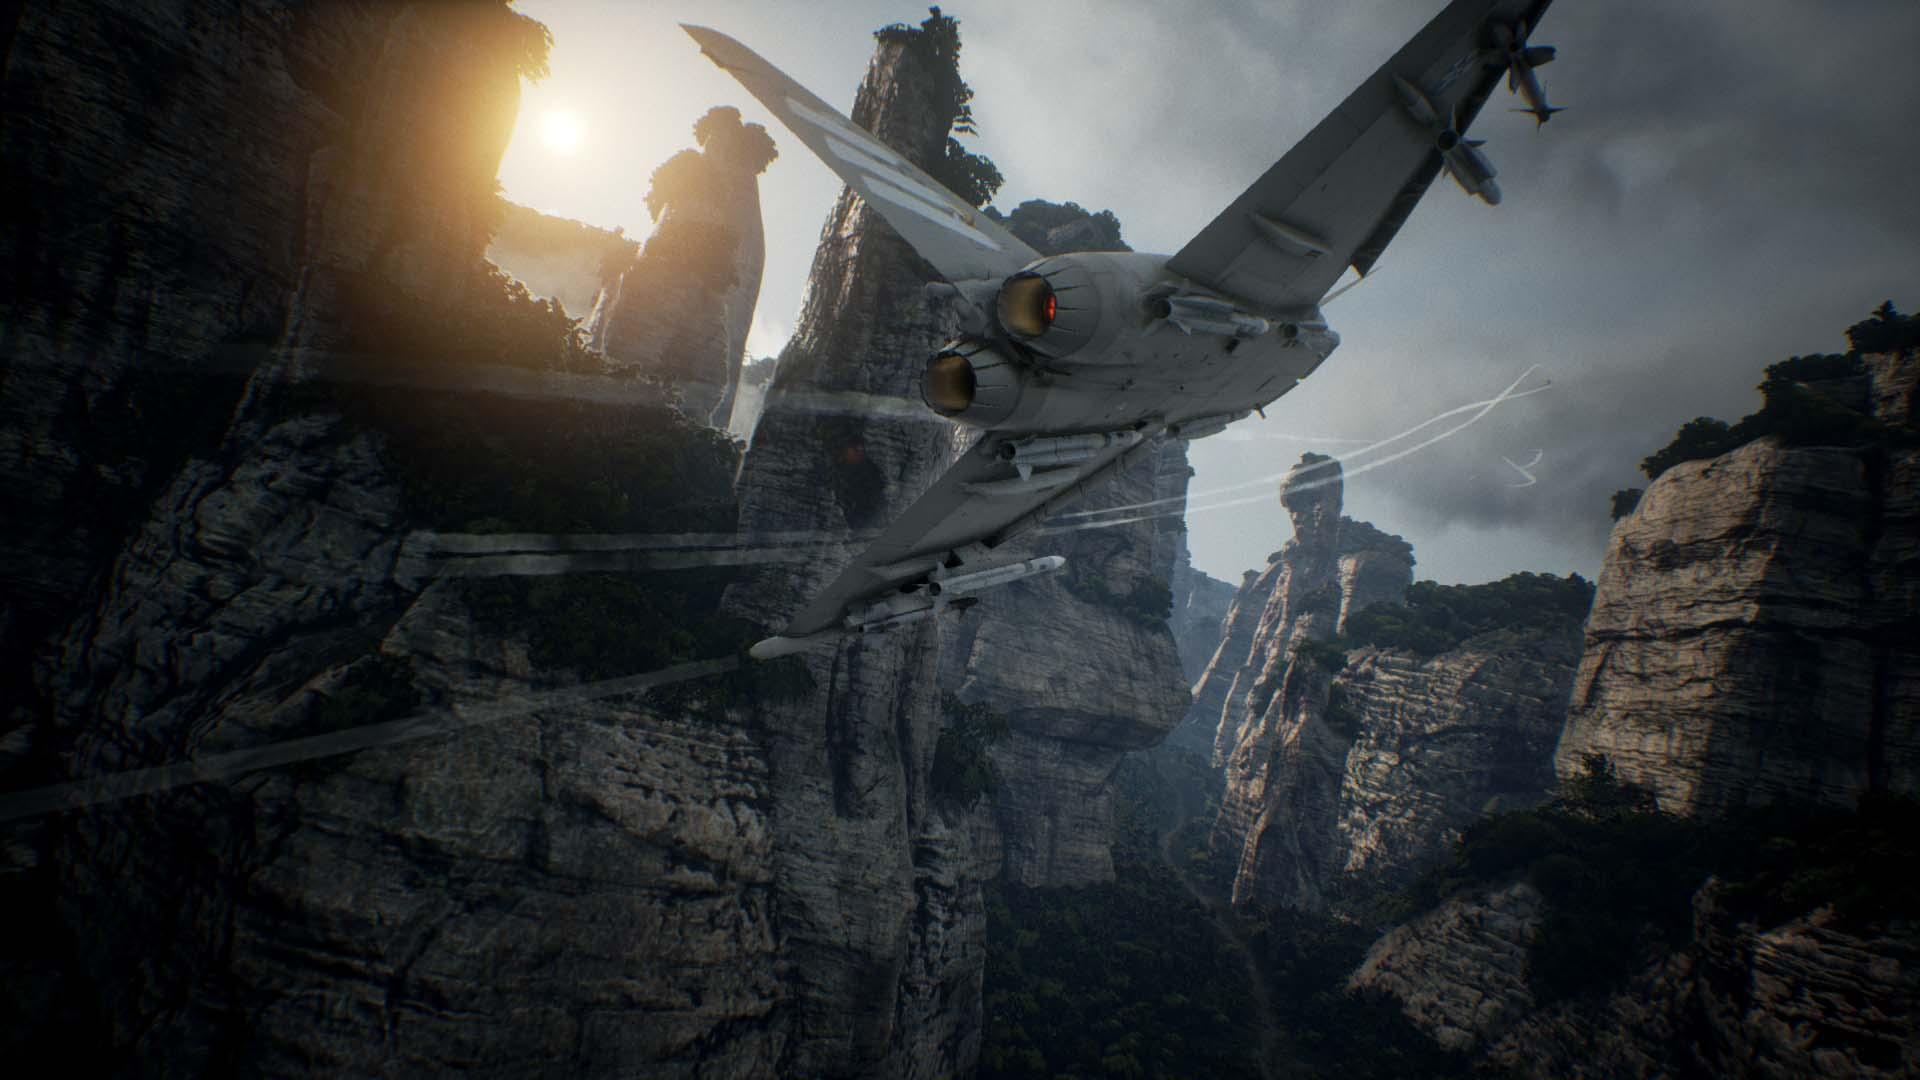 ace-combat-7-08-22-17-17.jpg